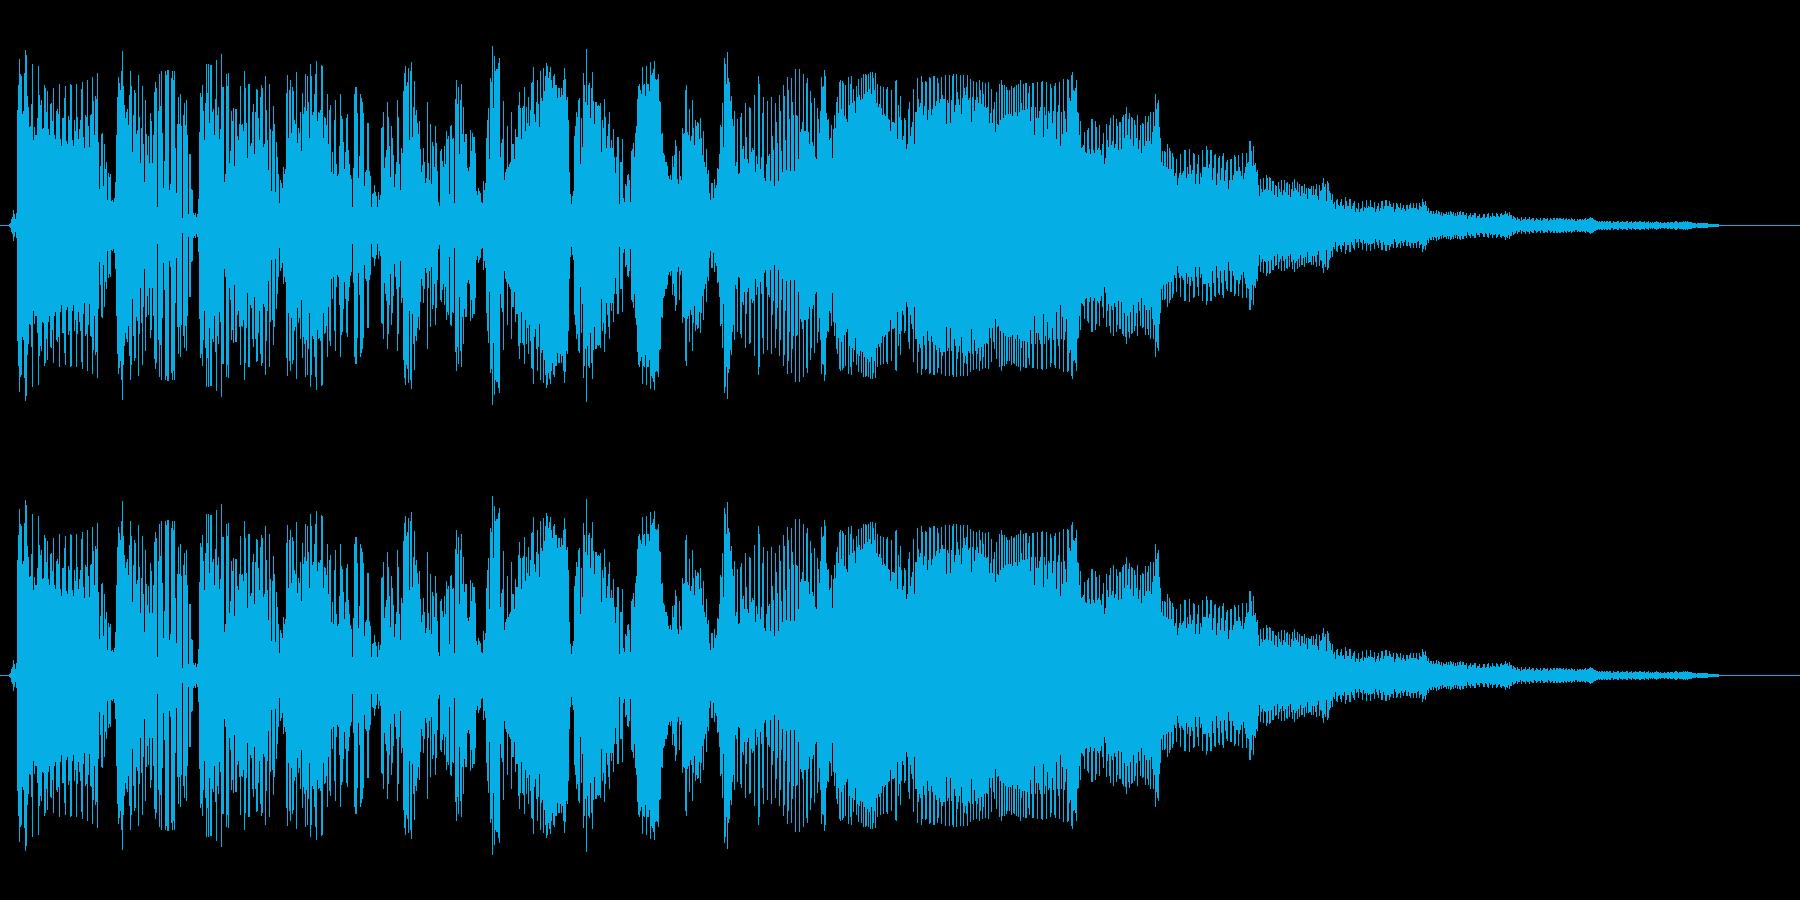 【SF系】ビヨビヨビヨビヨの再生済みの波形